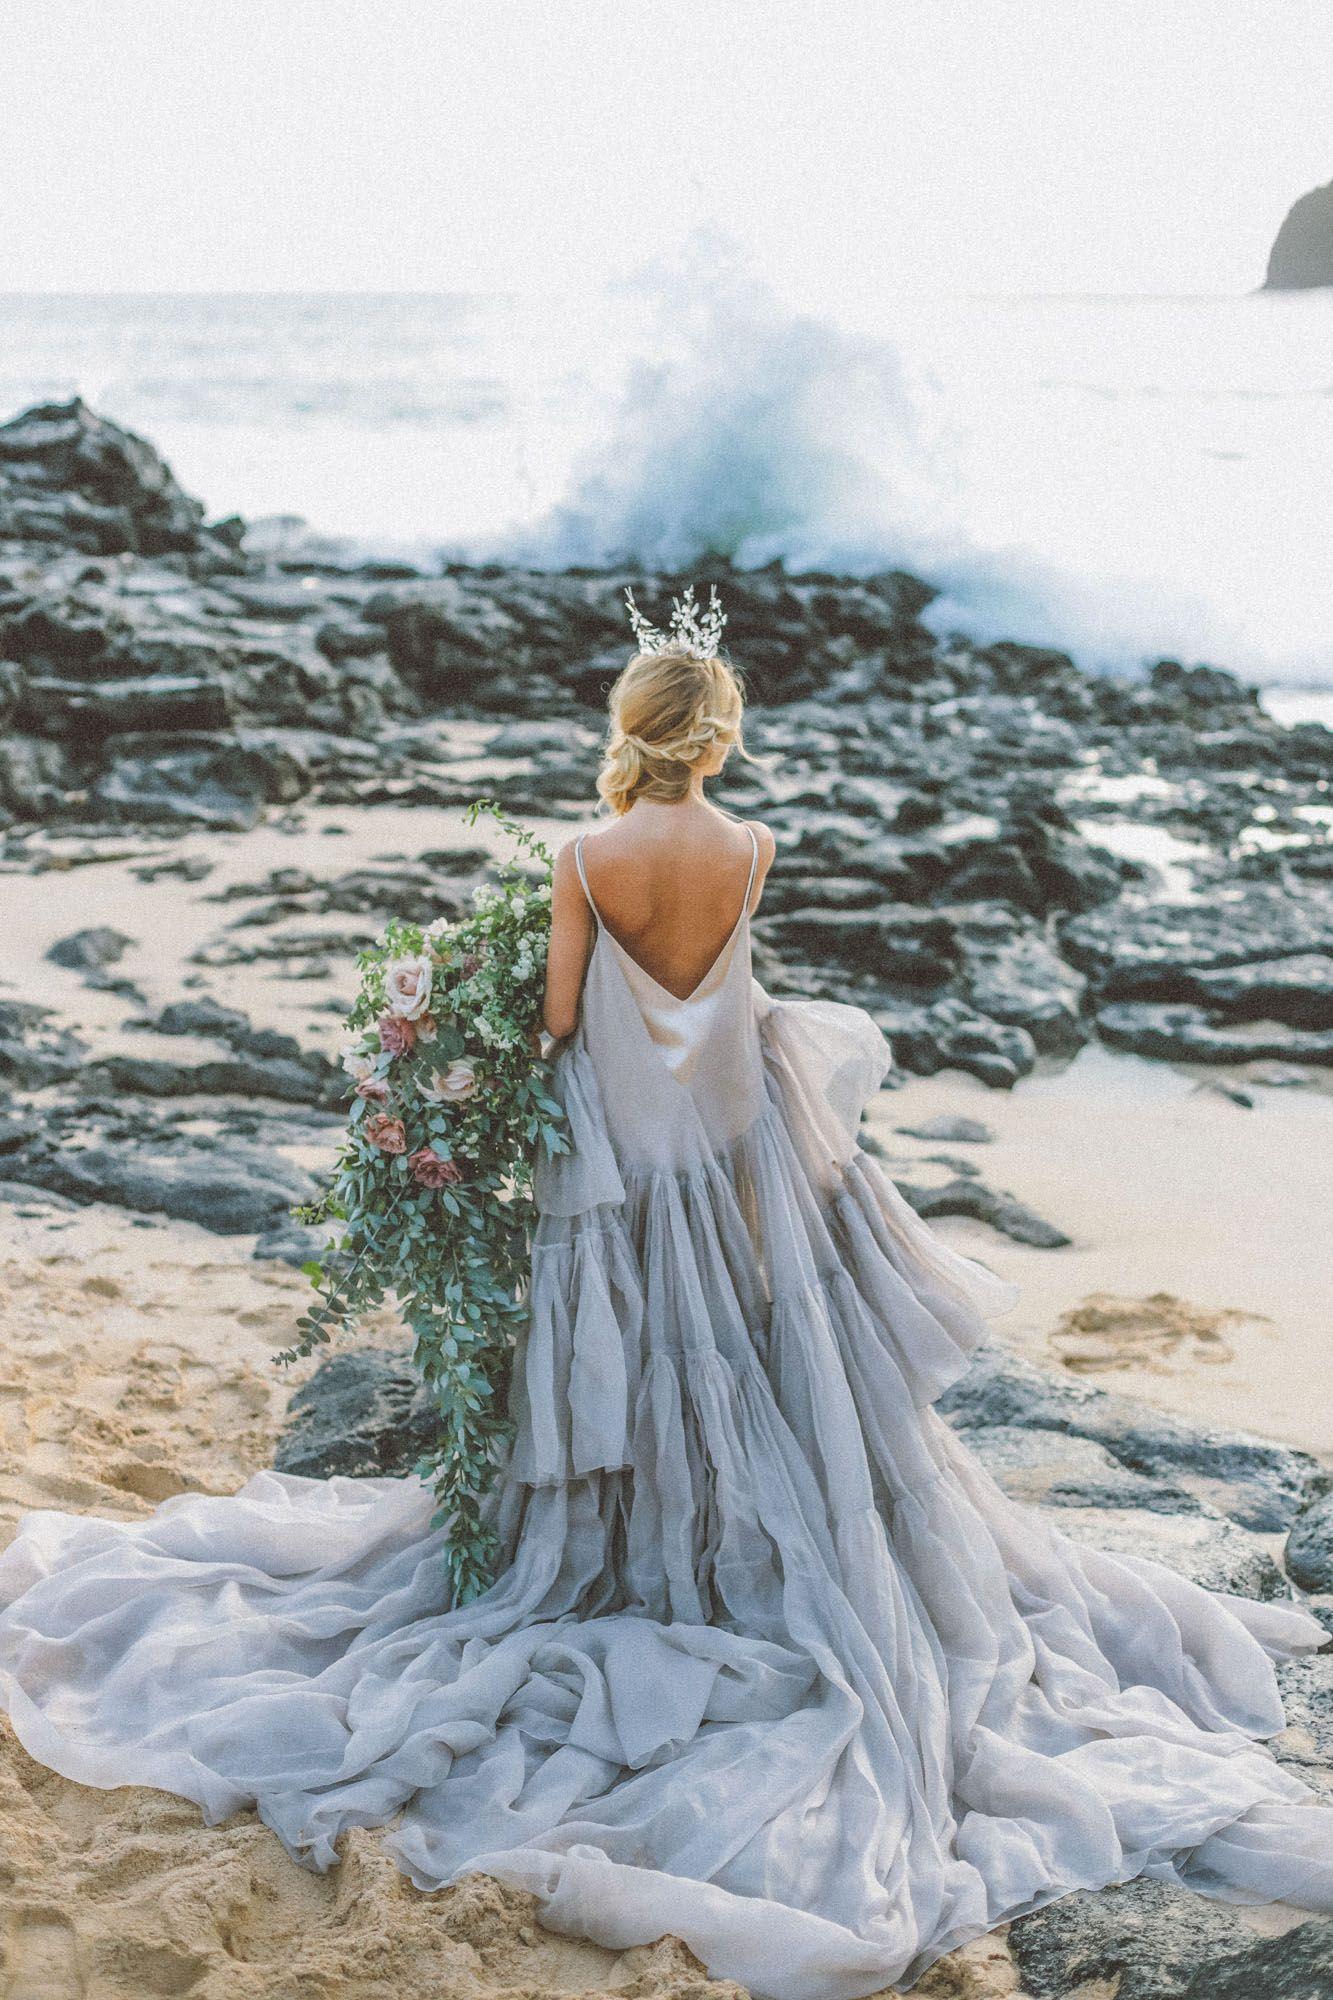 angie diaz hawaii wedding photographer for the romantic wild